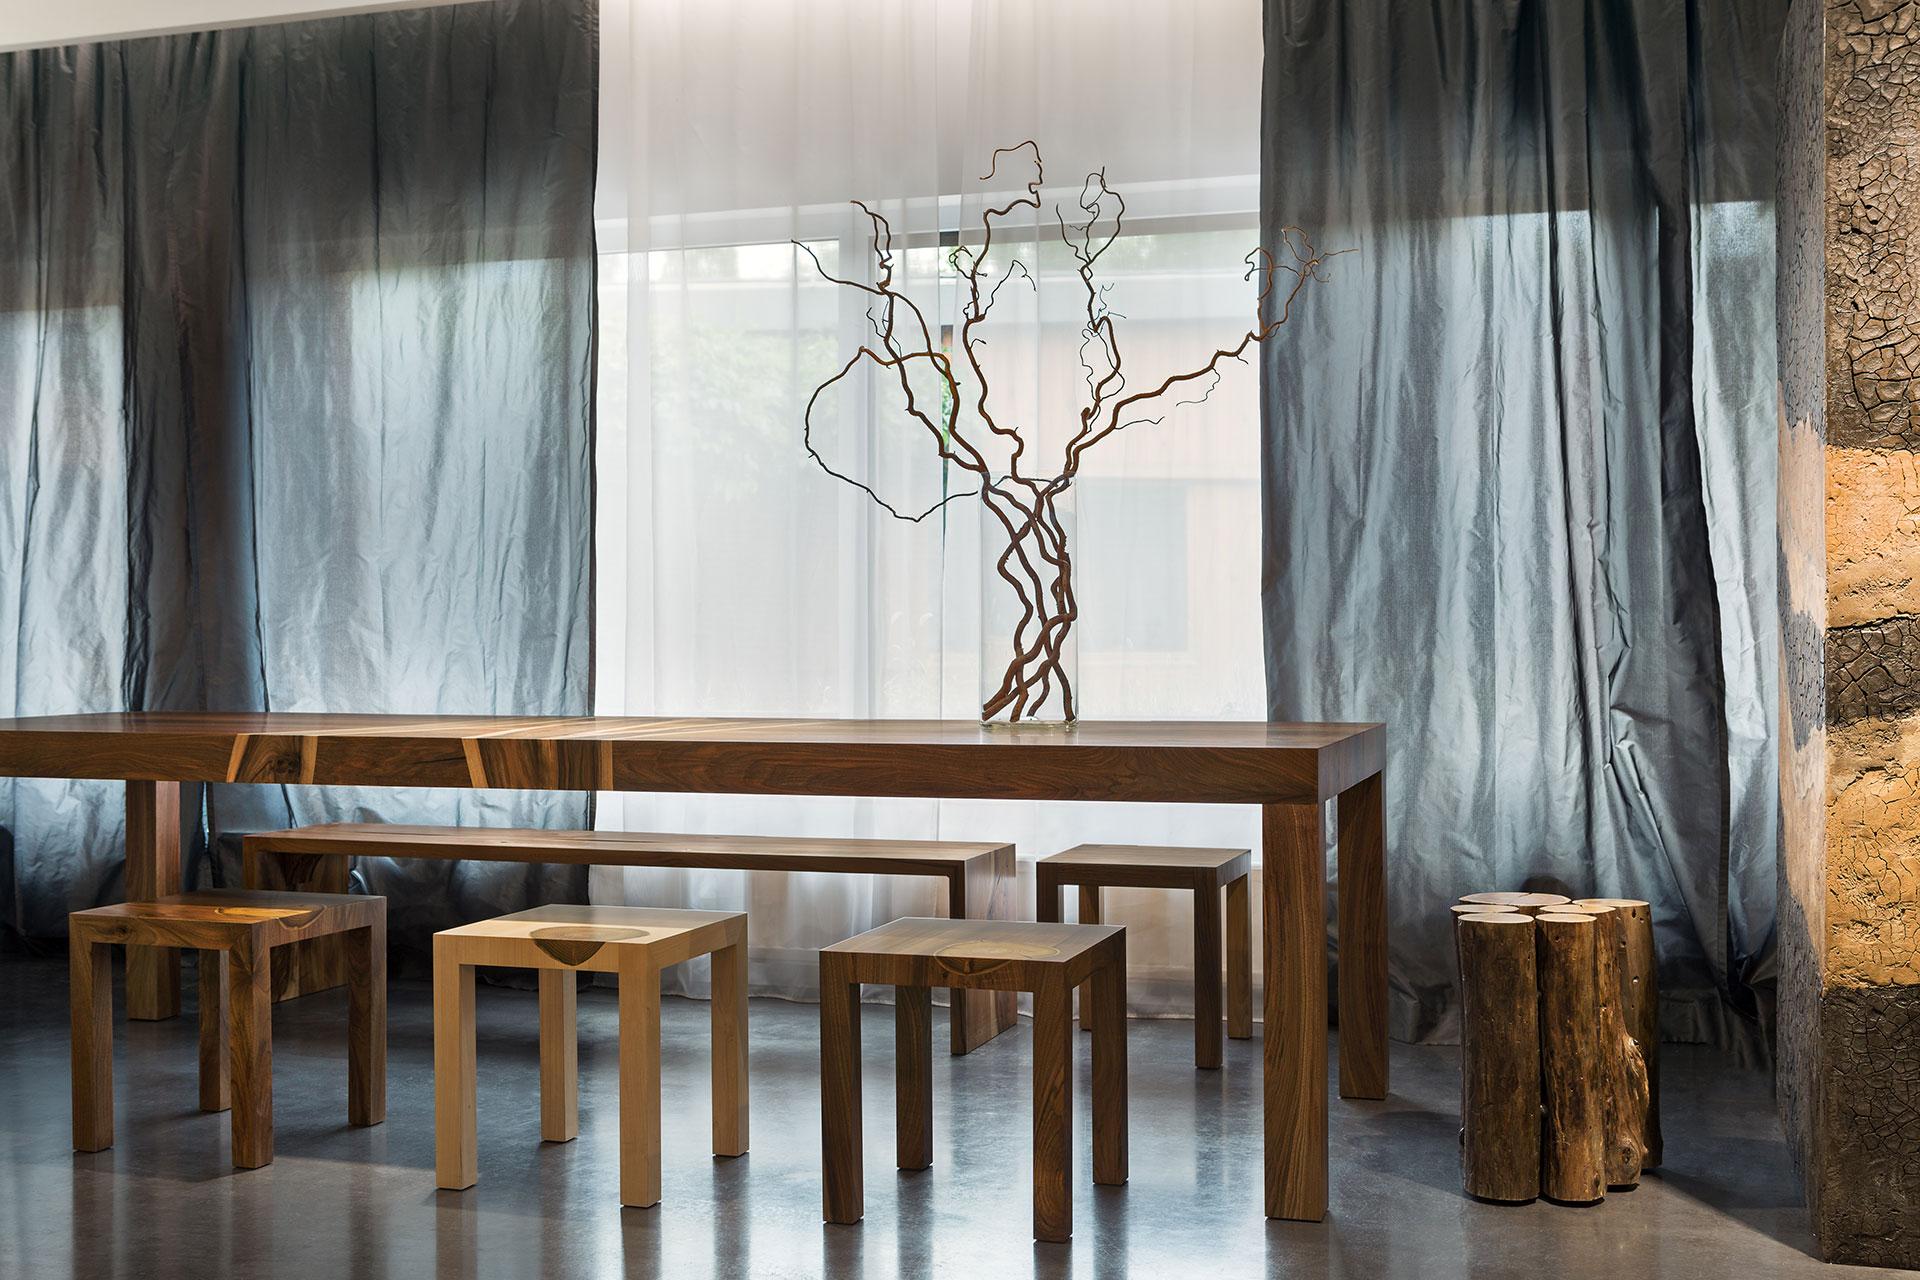 Furniture Schedule Interior Design ~ Yuriy ryntovt architecture interior design production of